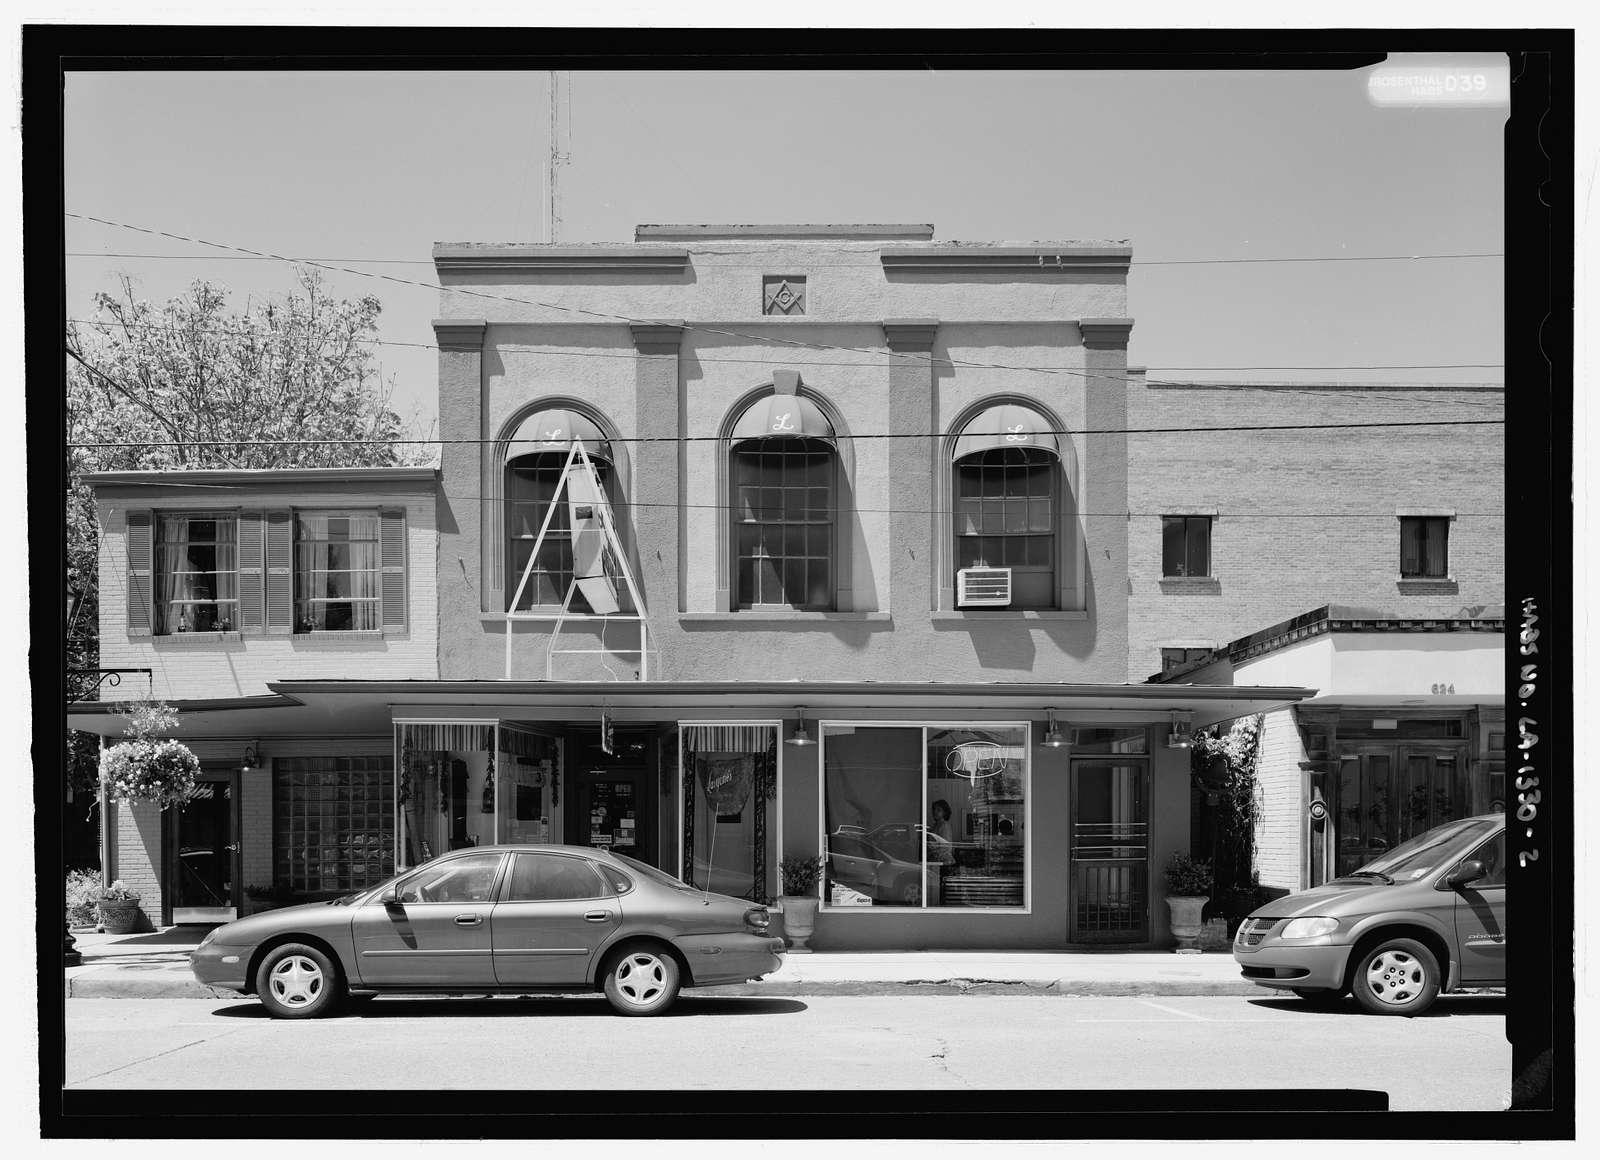 Masonic Lodge, 622 Second Street, Natchitoches, Natchitoches Parish, LA